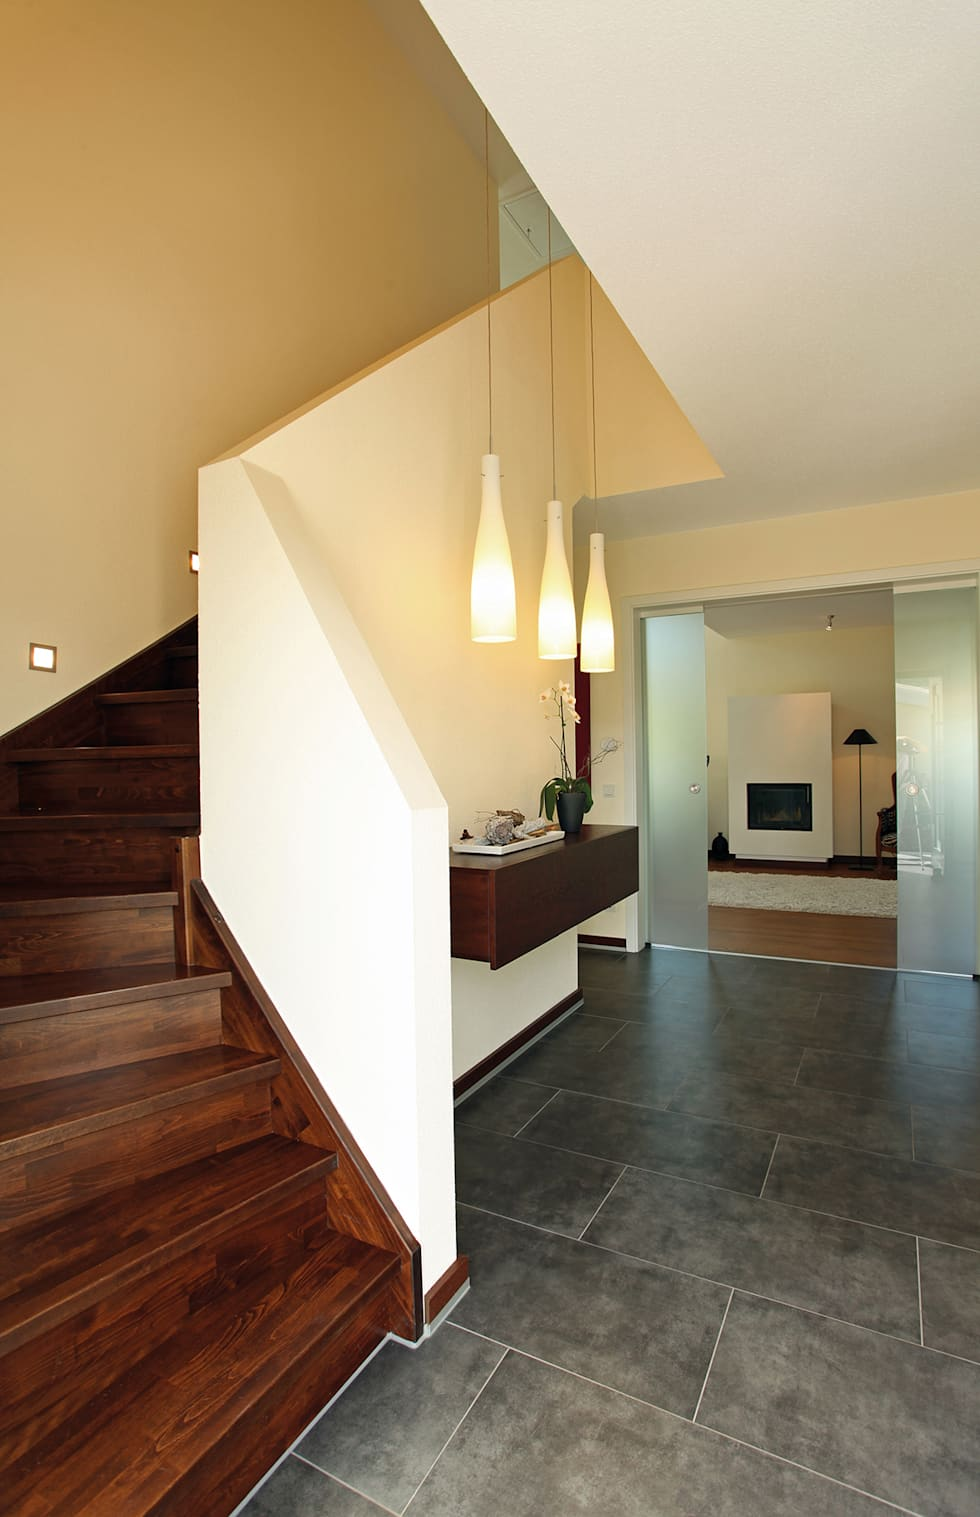 Wohnideen interior design einrichtungsideen bilder for Farbideen flur